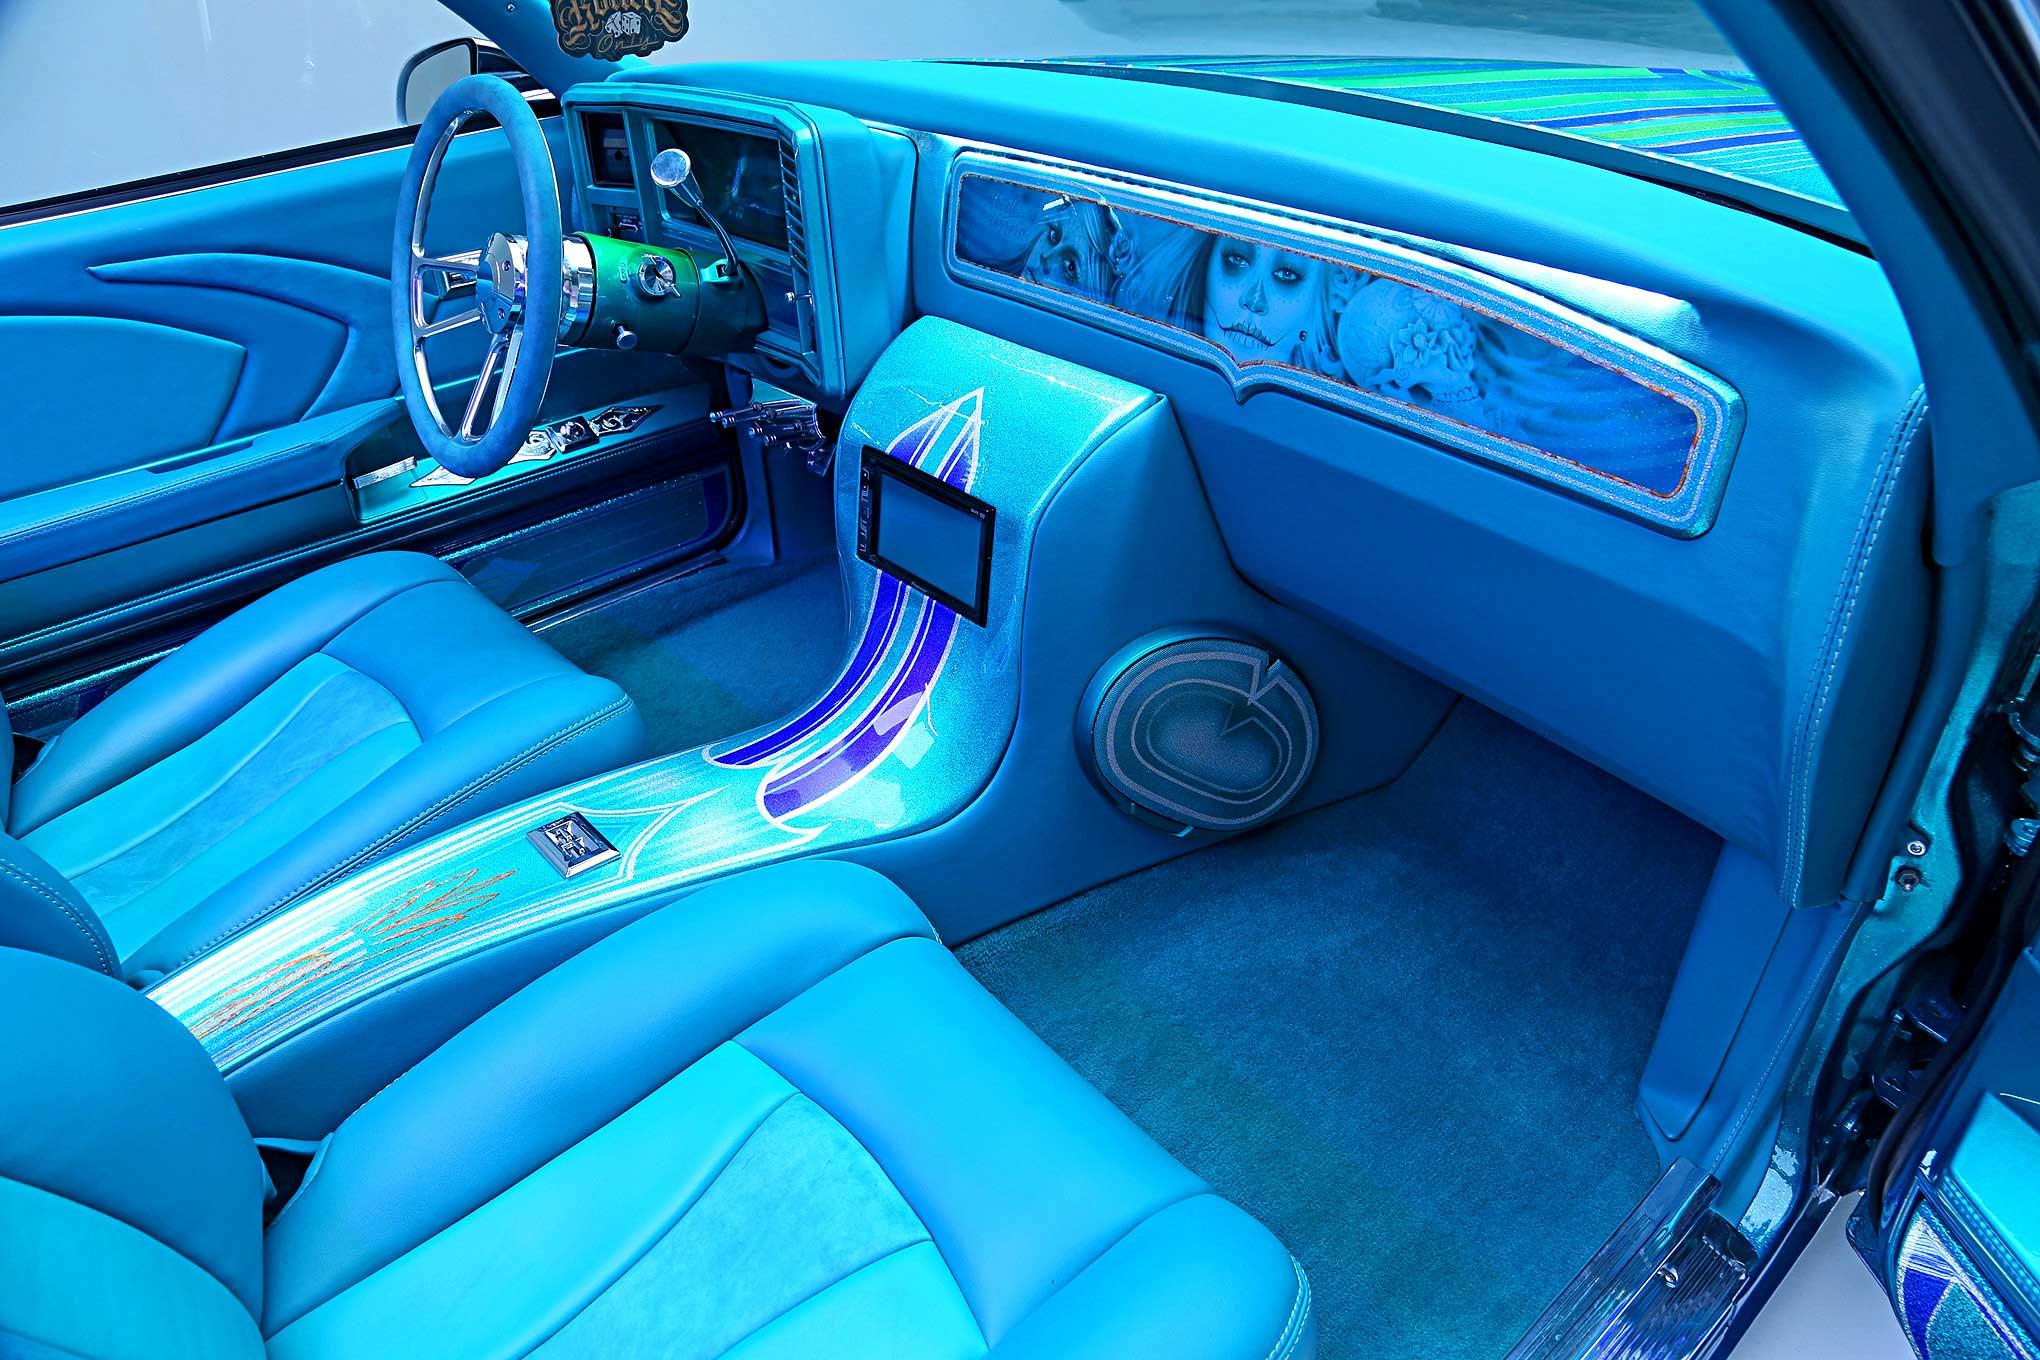 1979 Chevrolet Monte Carlo Custom Teal Interior Lowrider